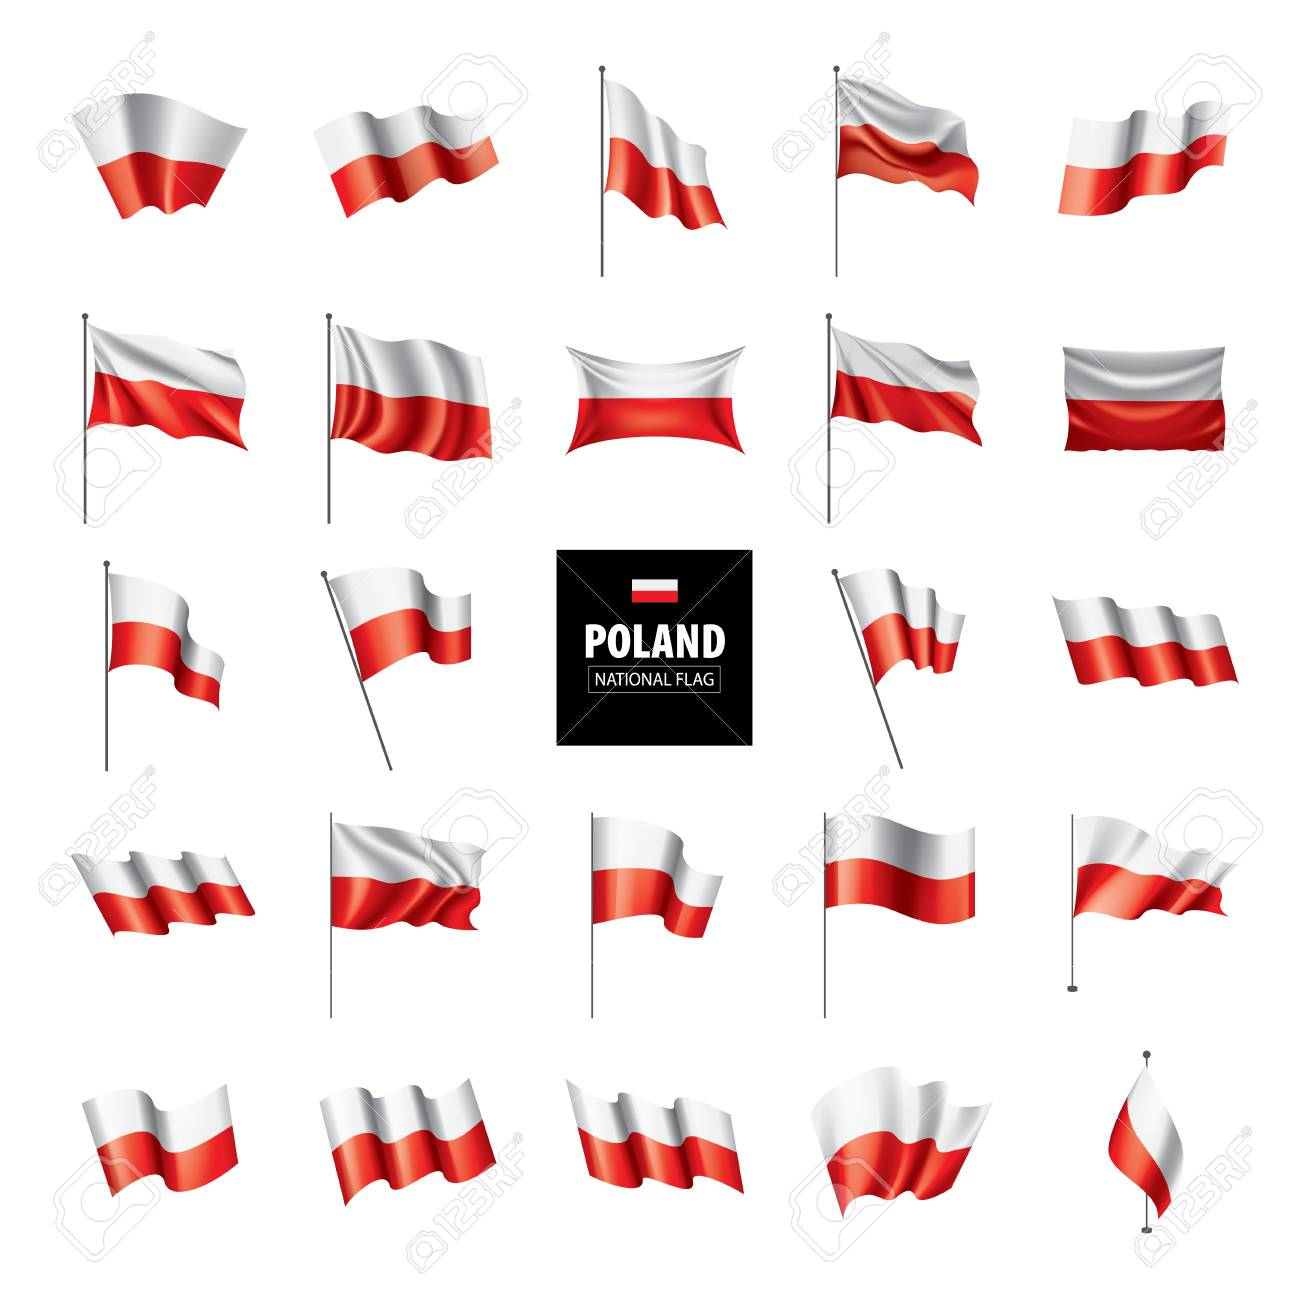 Poland flag, vector illustration on a white background - 112236553